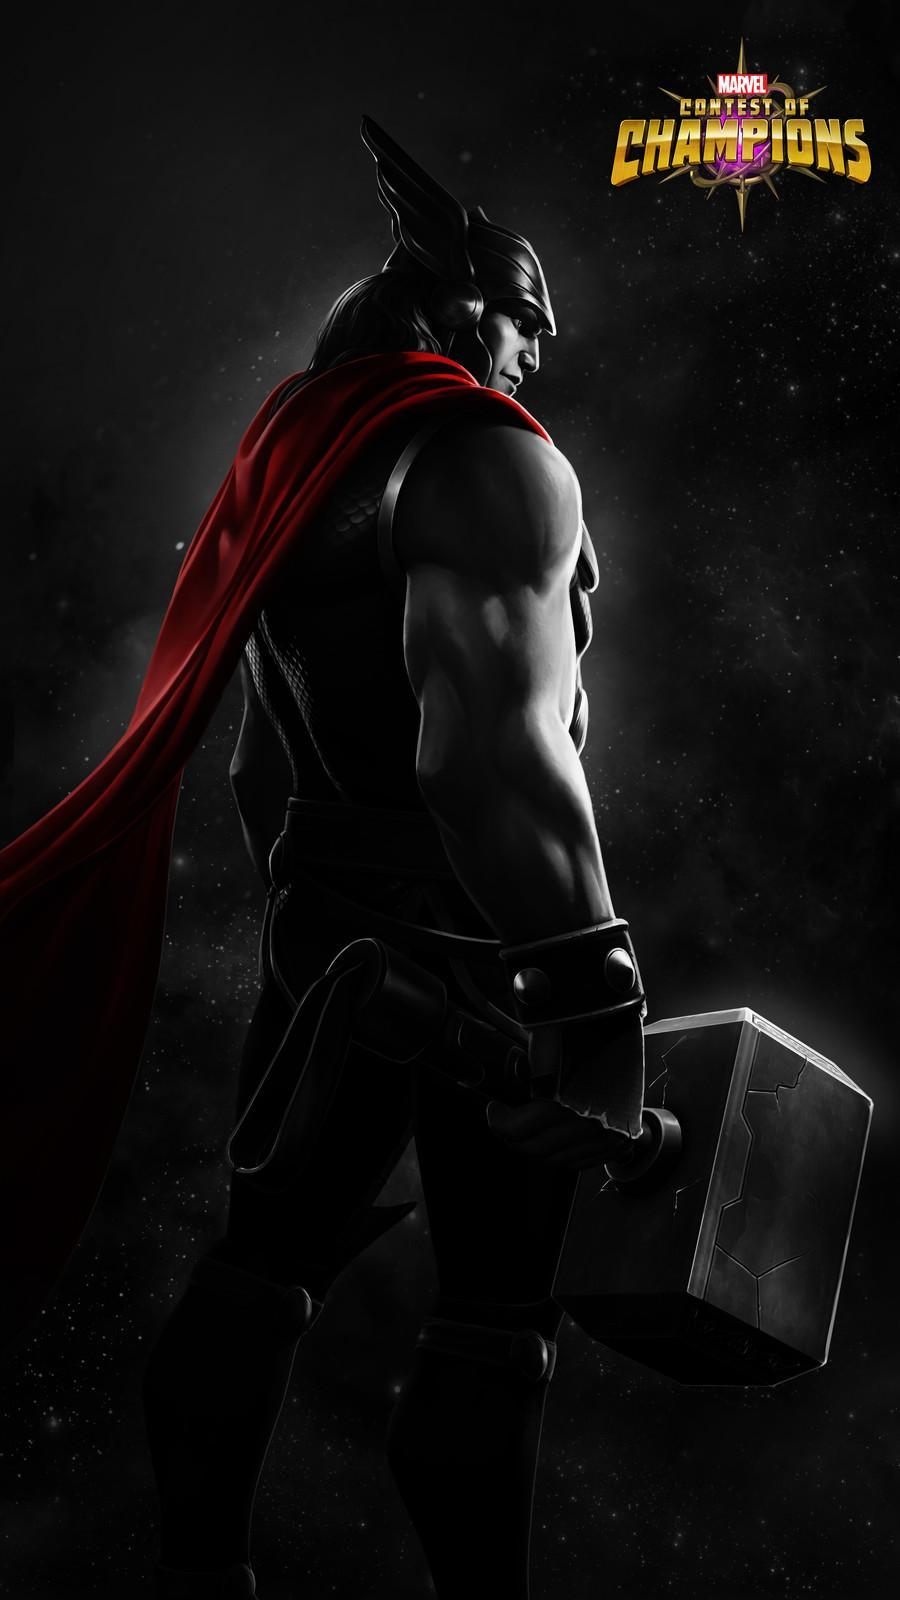 Marvel champions wallpapers wallpaper cave - Thor art wallpaper ...